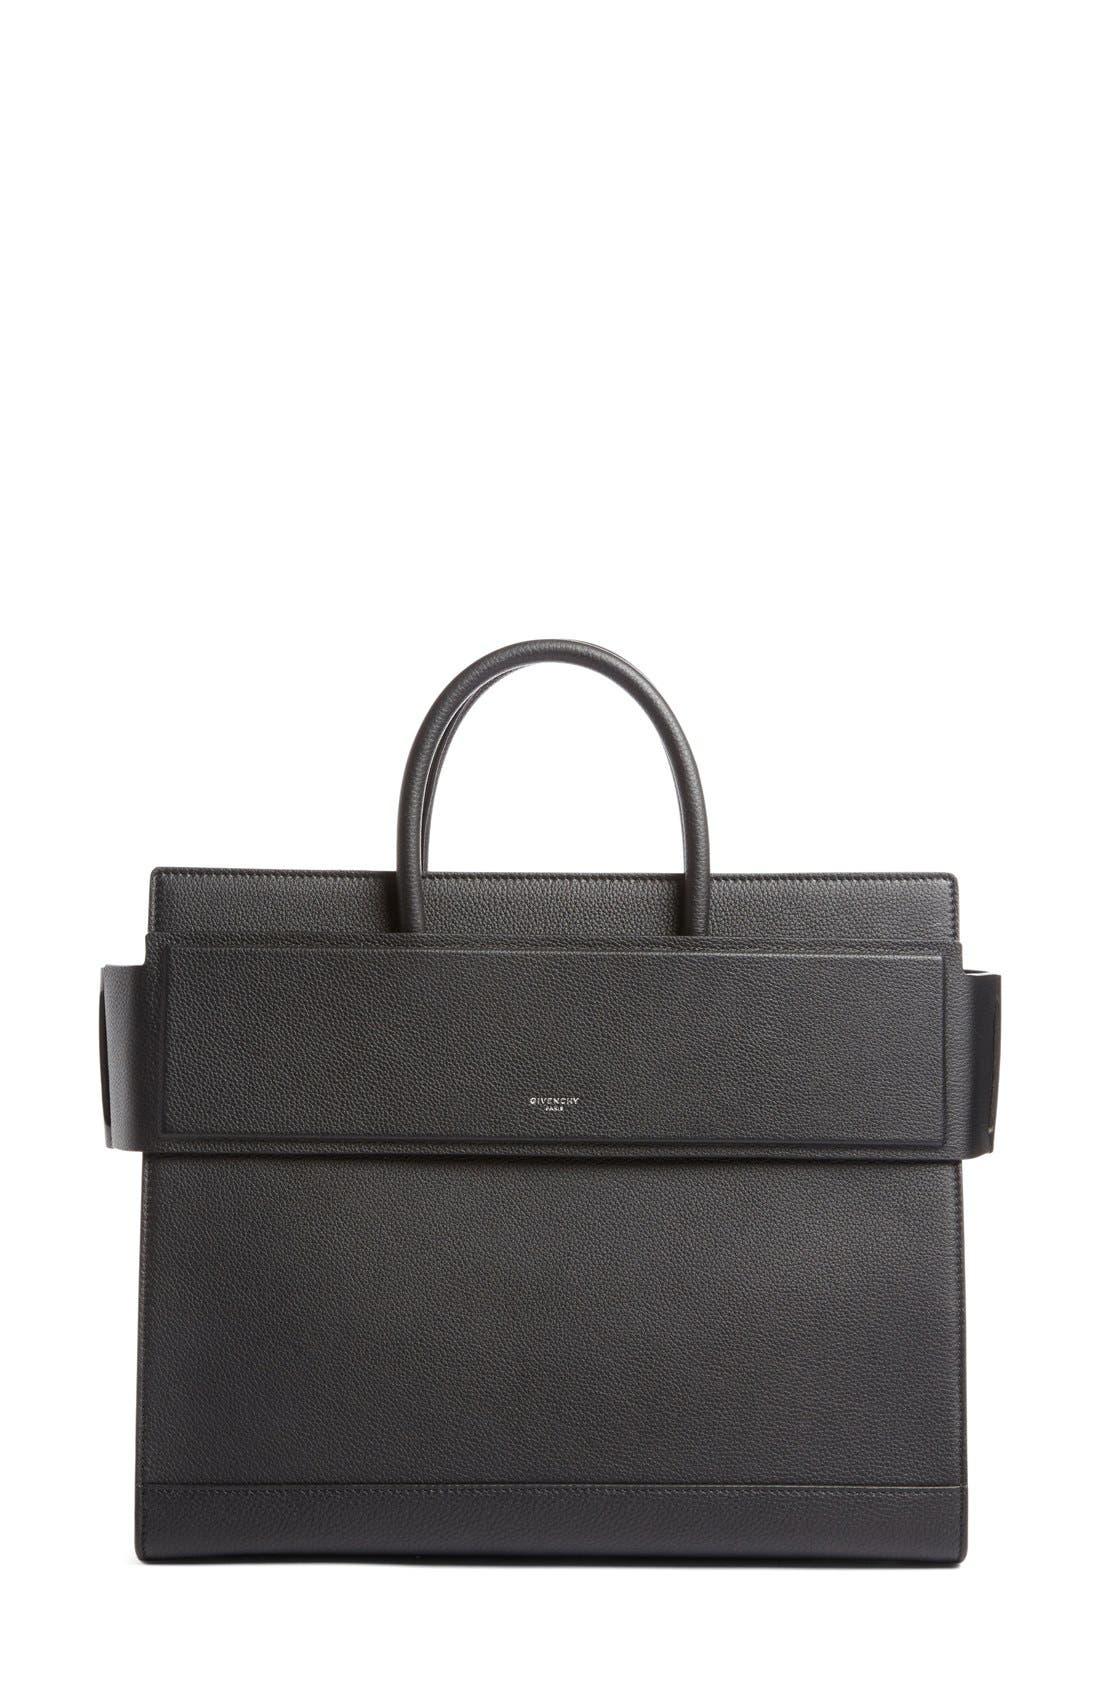 Main Image - Givenchy Medium Horizon Grained Calfskin Leather Tote